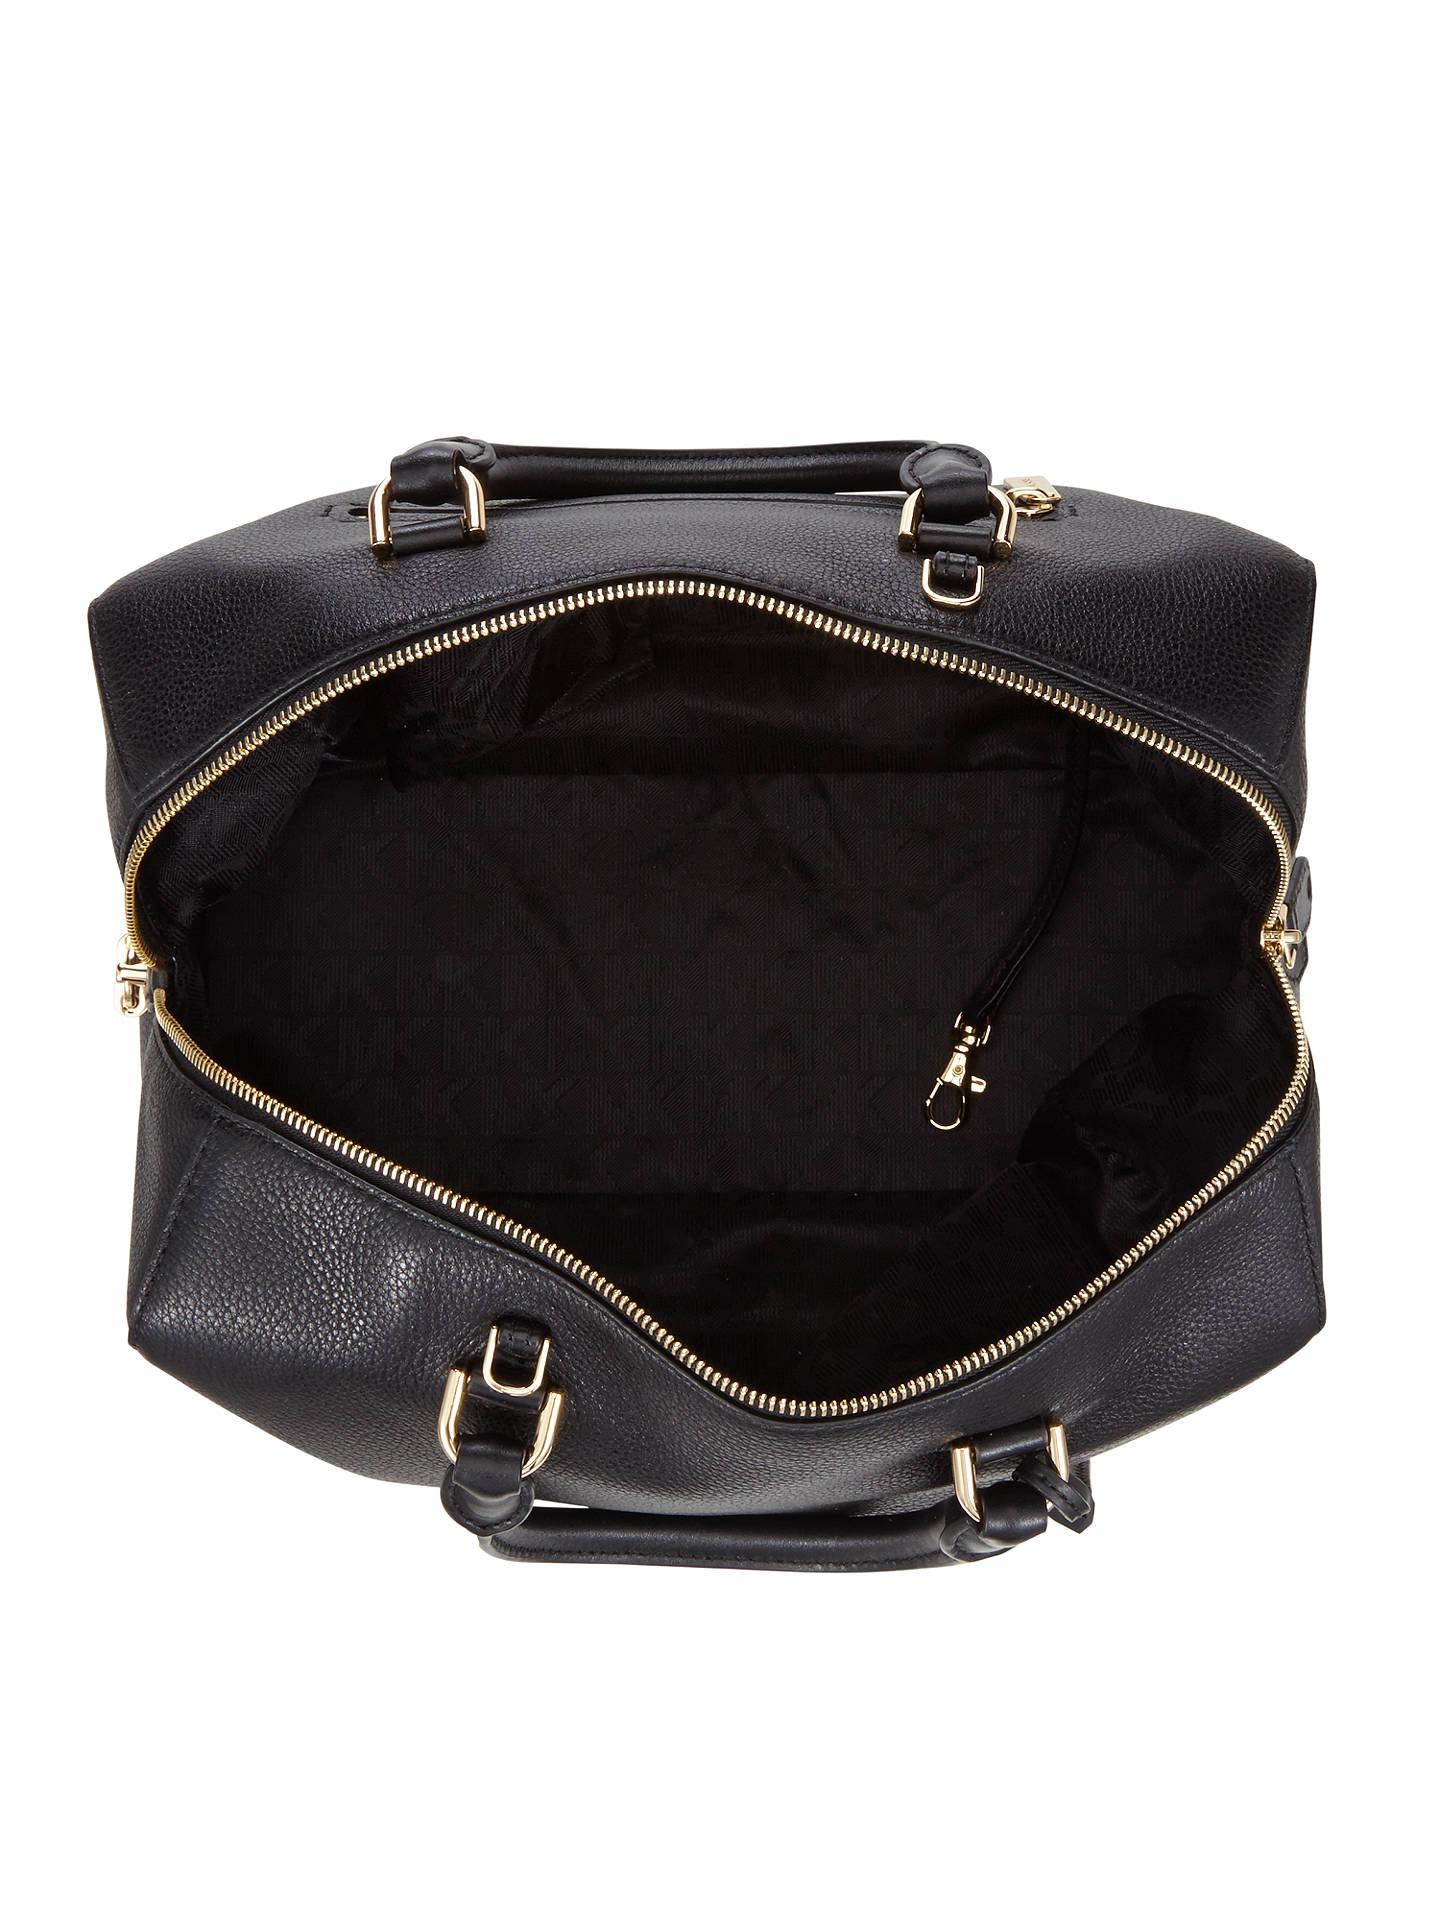 cbbeb2c78b5023 ... Buy MICHAEL Michael Kors Kirby Leather Large Satchel, Black Online at  johnlewis.com ...